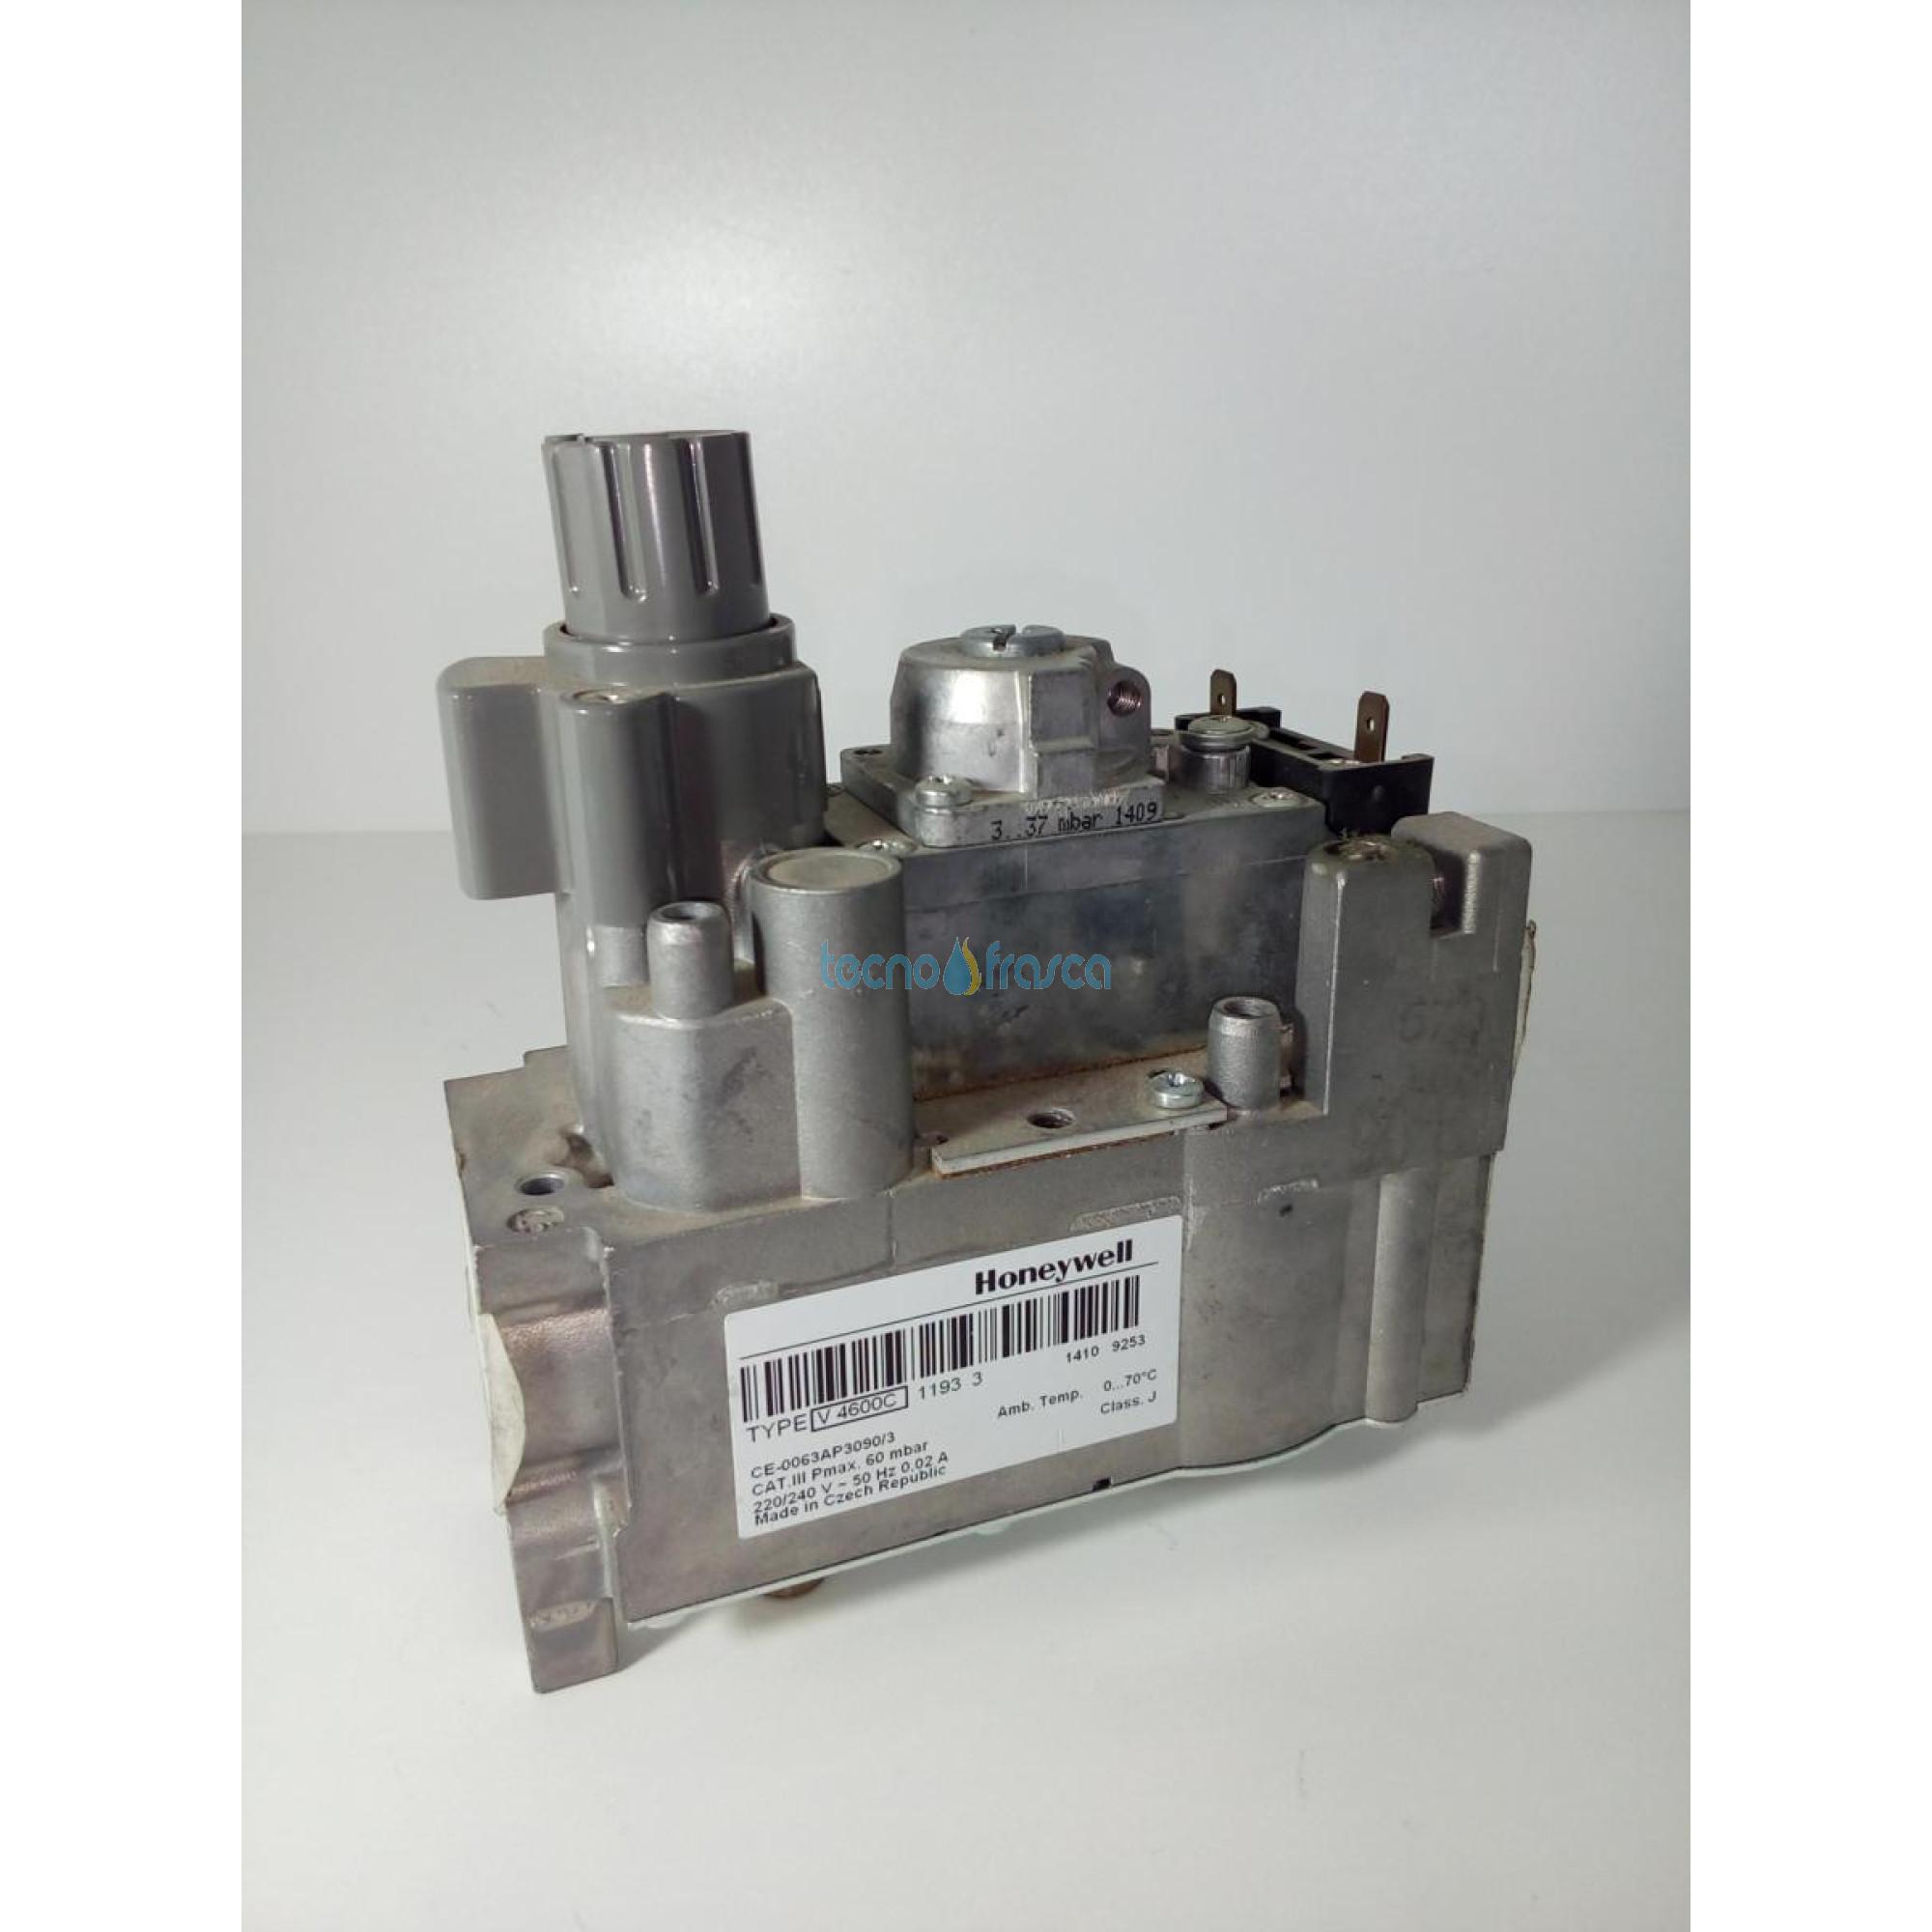 Valvola gas v4600c1086u hermann